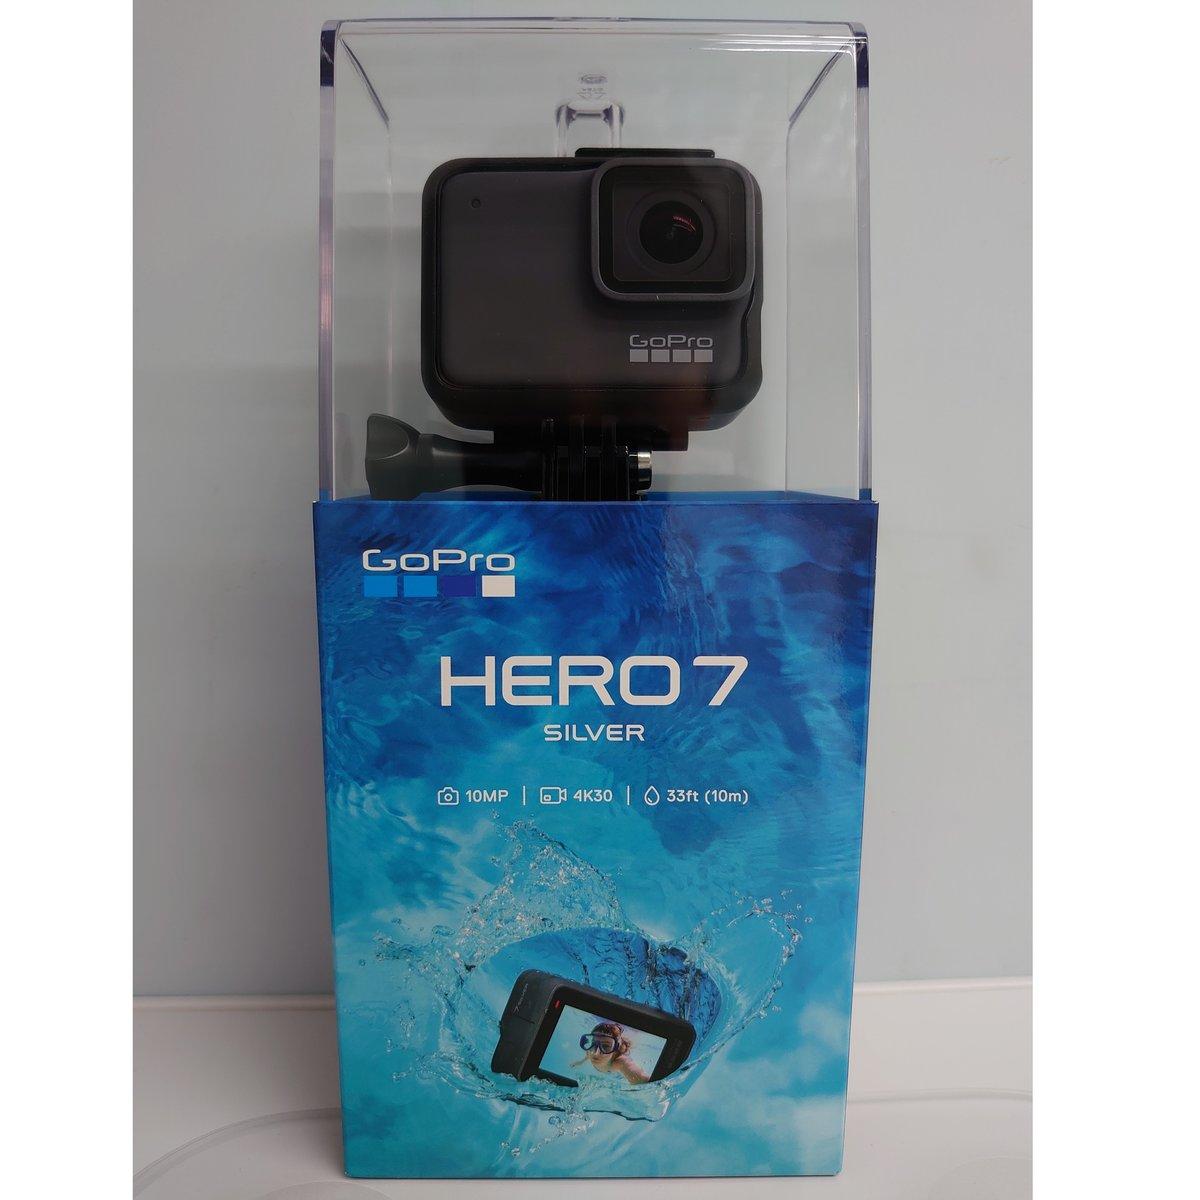 Hero7 Silver Waterproof Action Camera Parallel Import